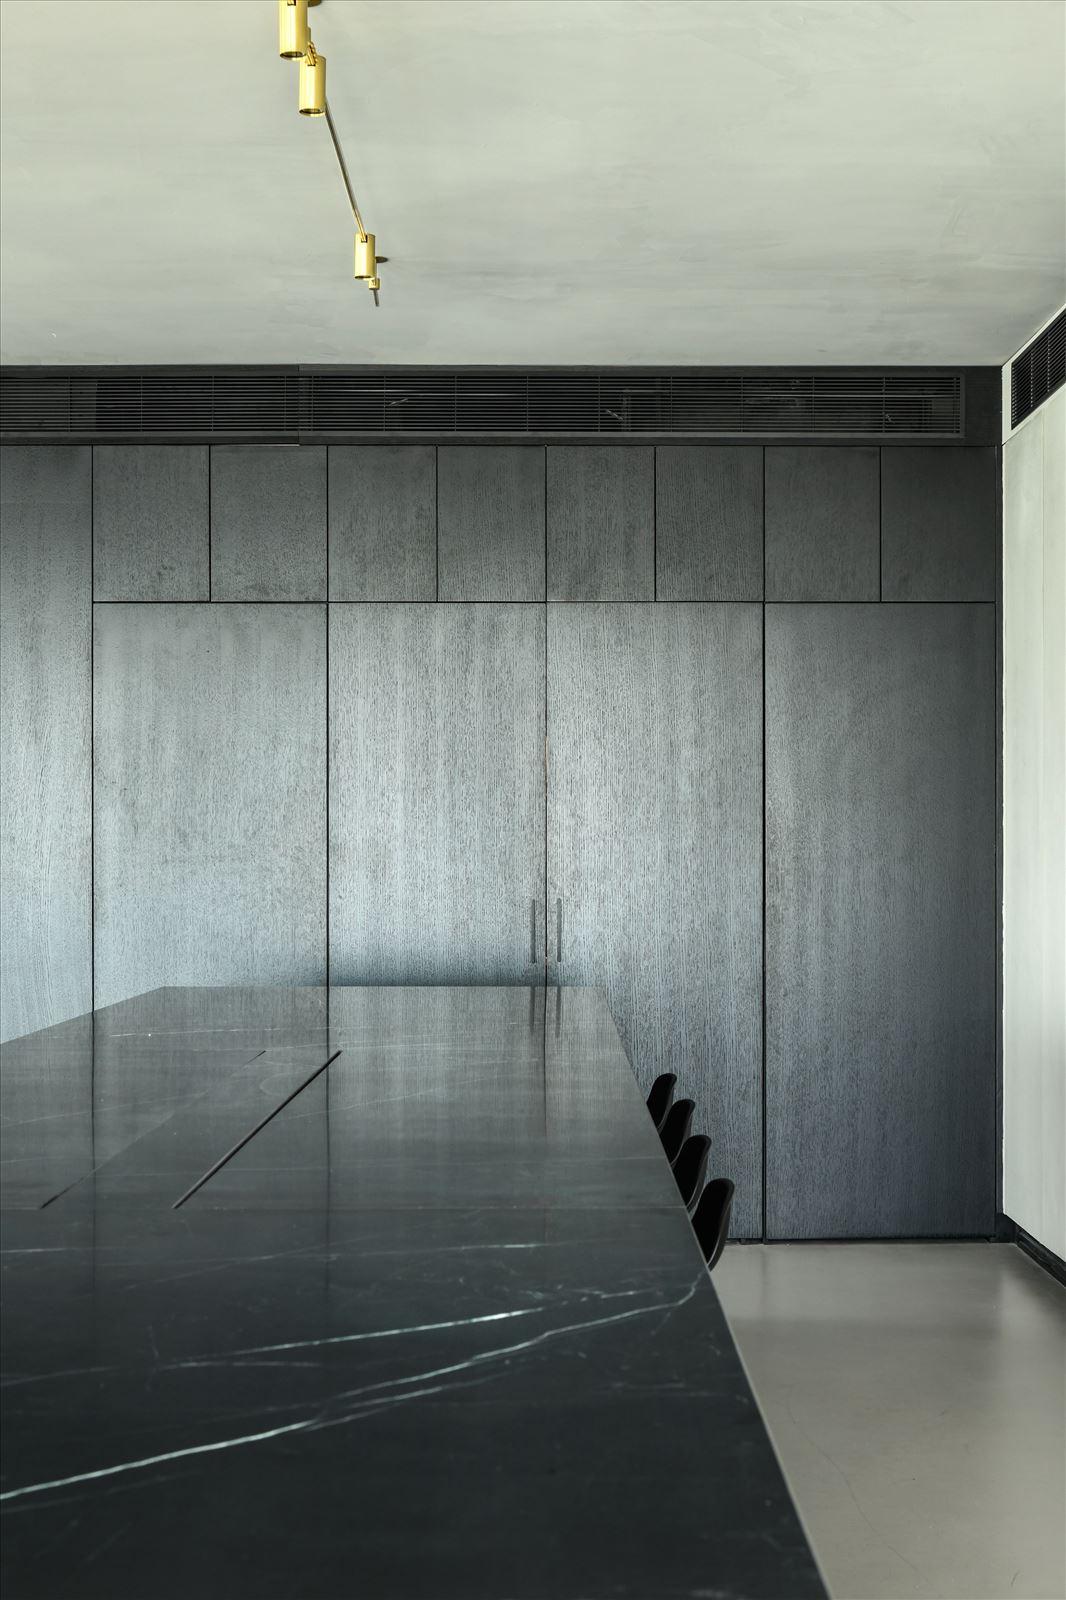 Divident office עיצוב מיוחד של גוף תאורה מעל מזנון בעיצוב של קמחי תאורה